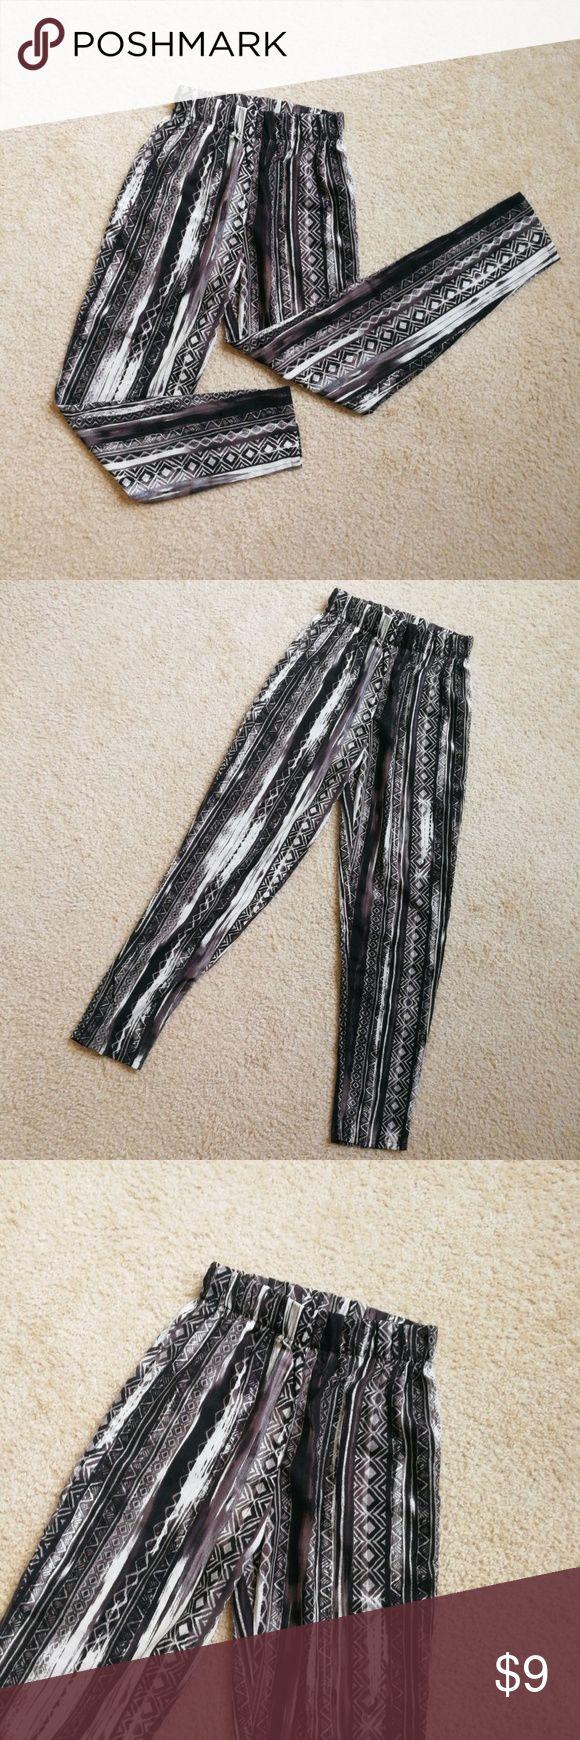 Ambiance Apparel Women's Tribal Print Pants Ambiance Apparel Women's Tribal Print Pants Size:  S Pants